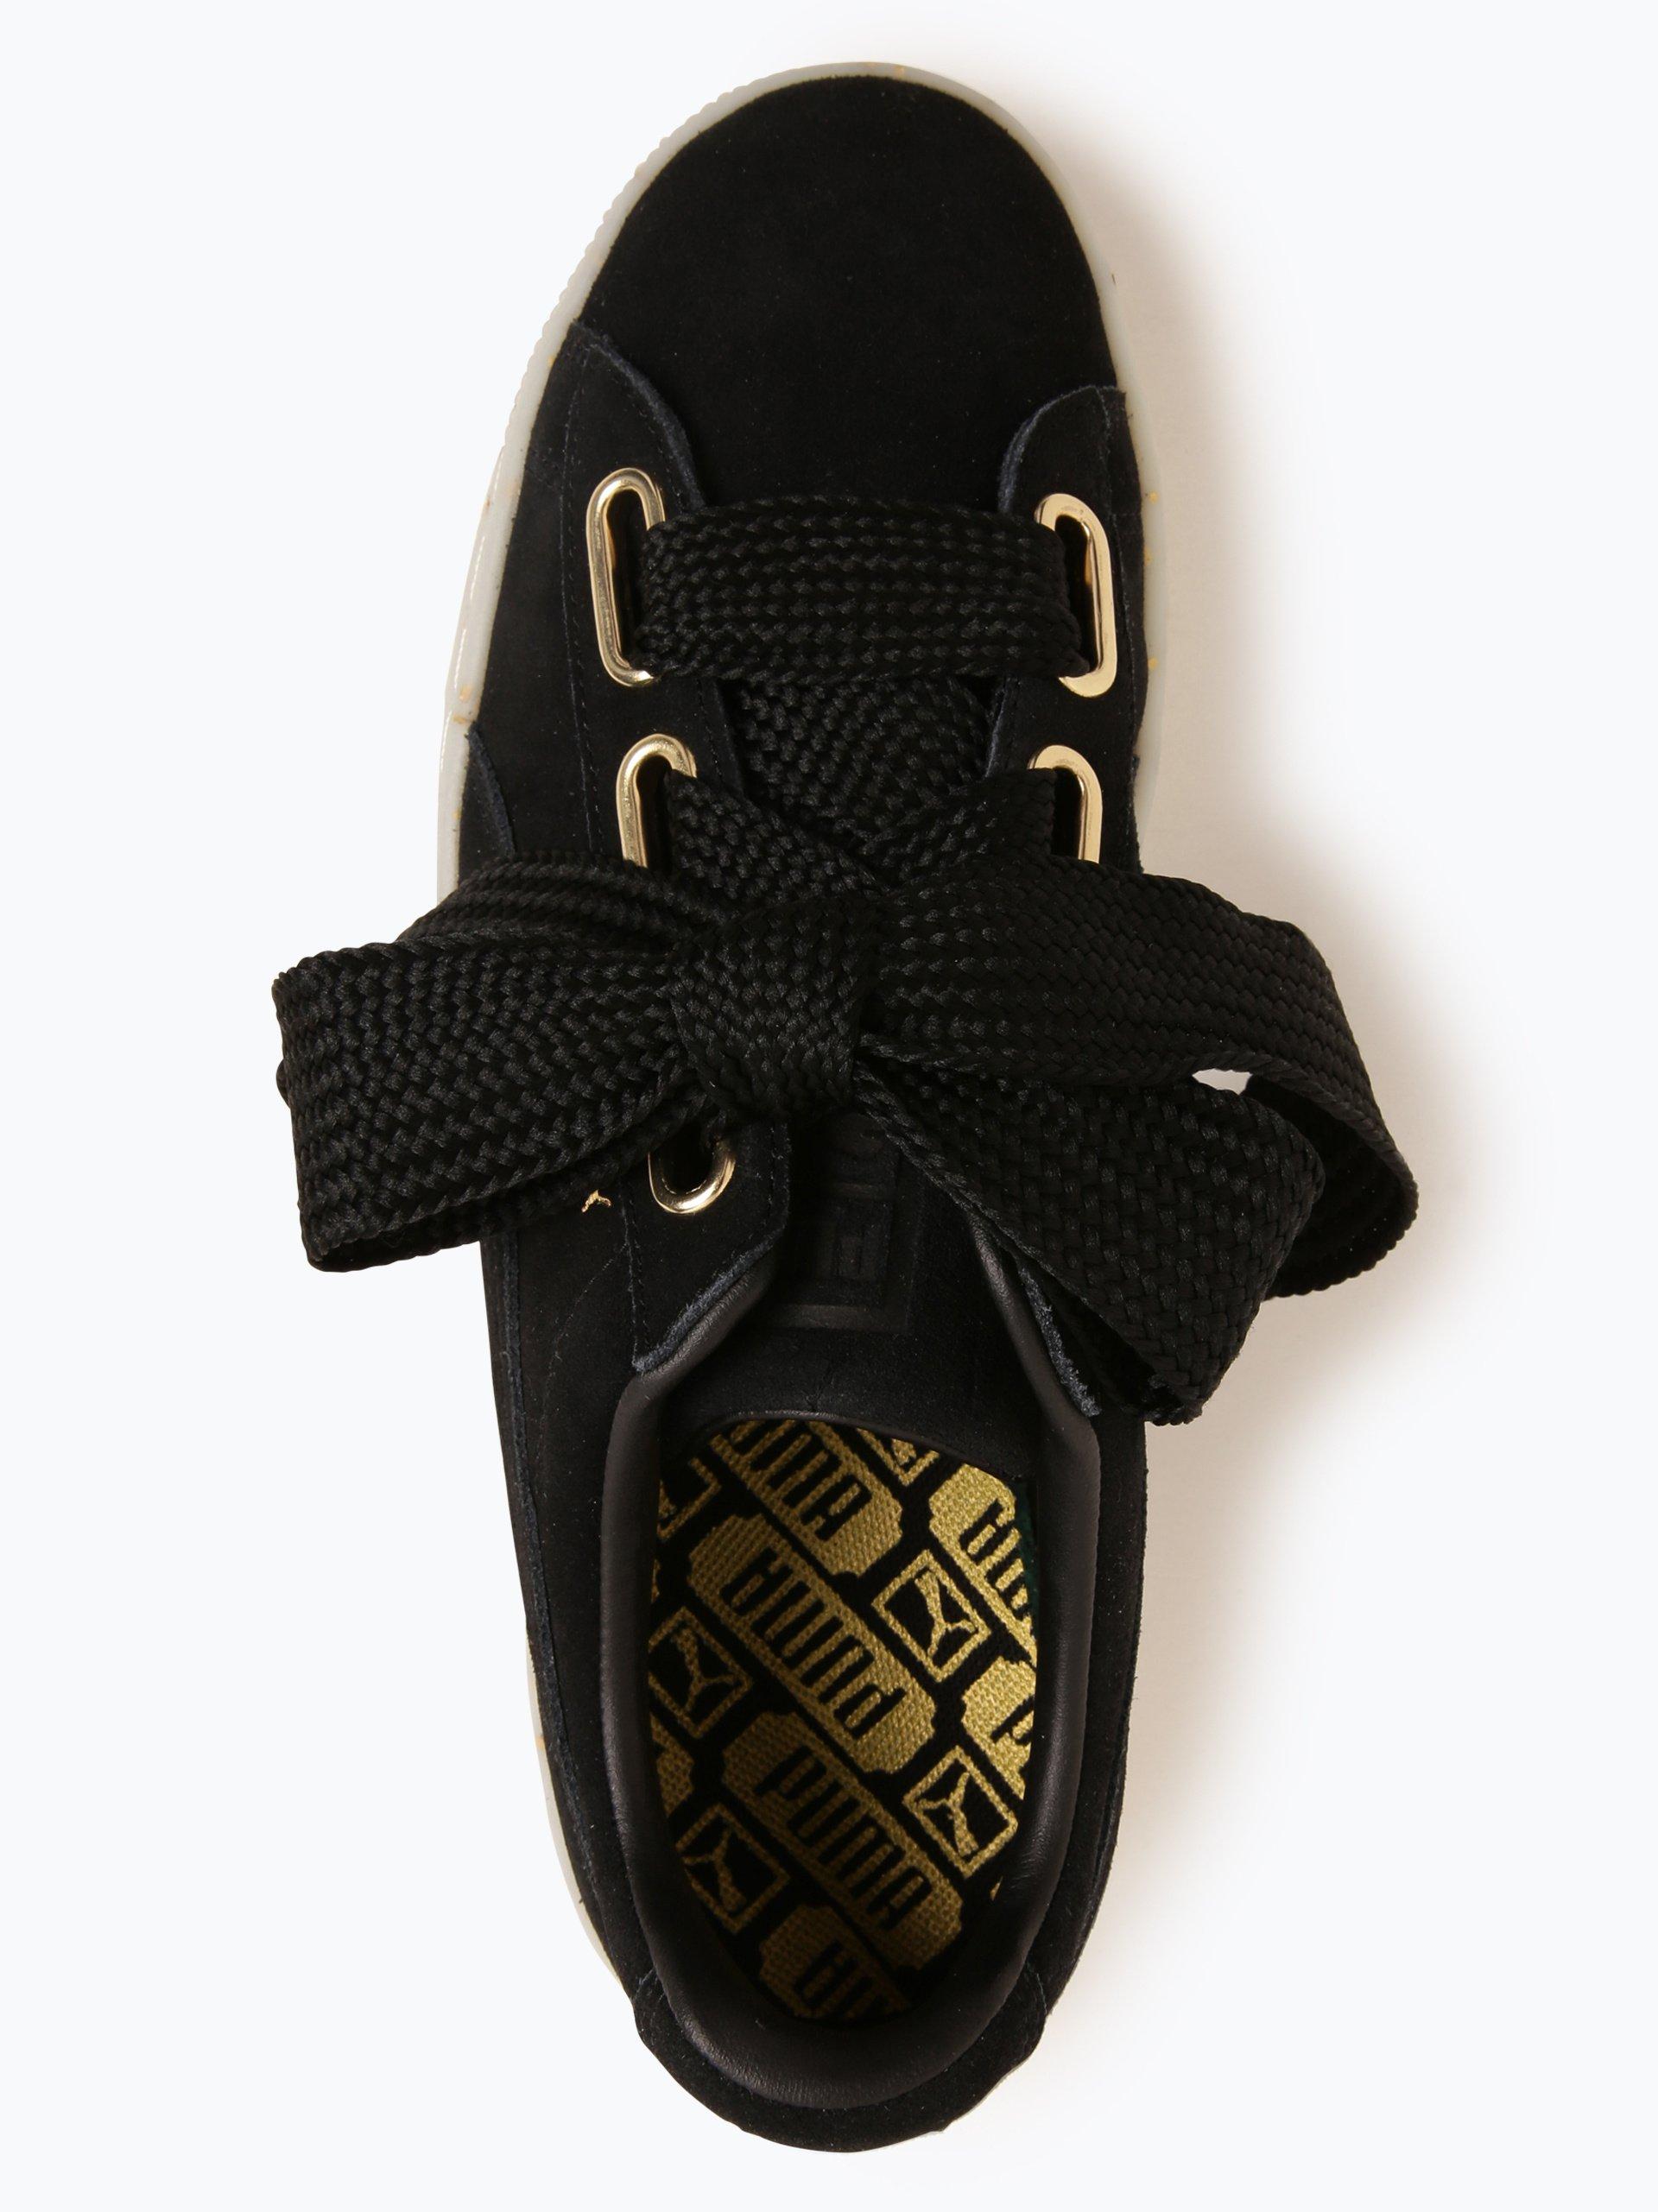 Puma Damen Sneaker aus Leder - Heart Celebrate